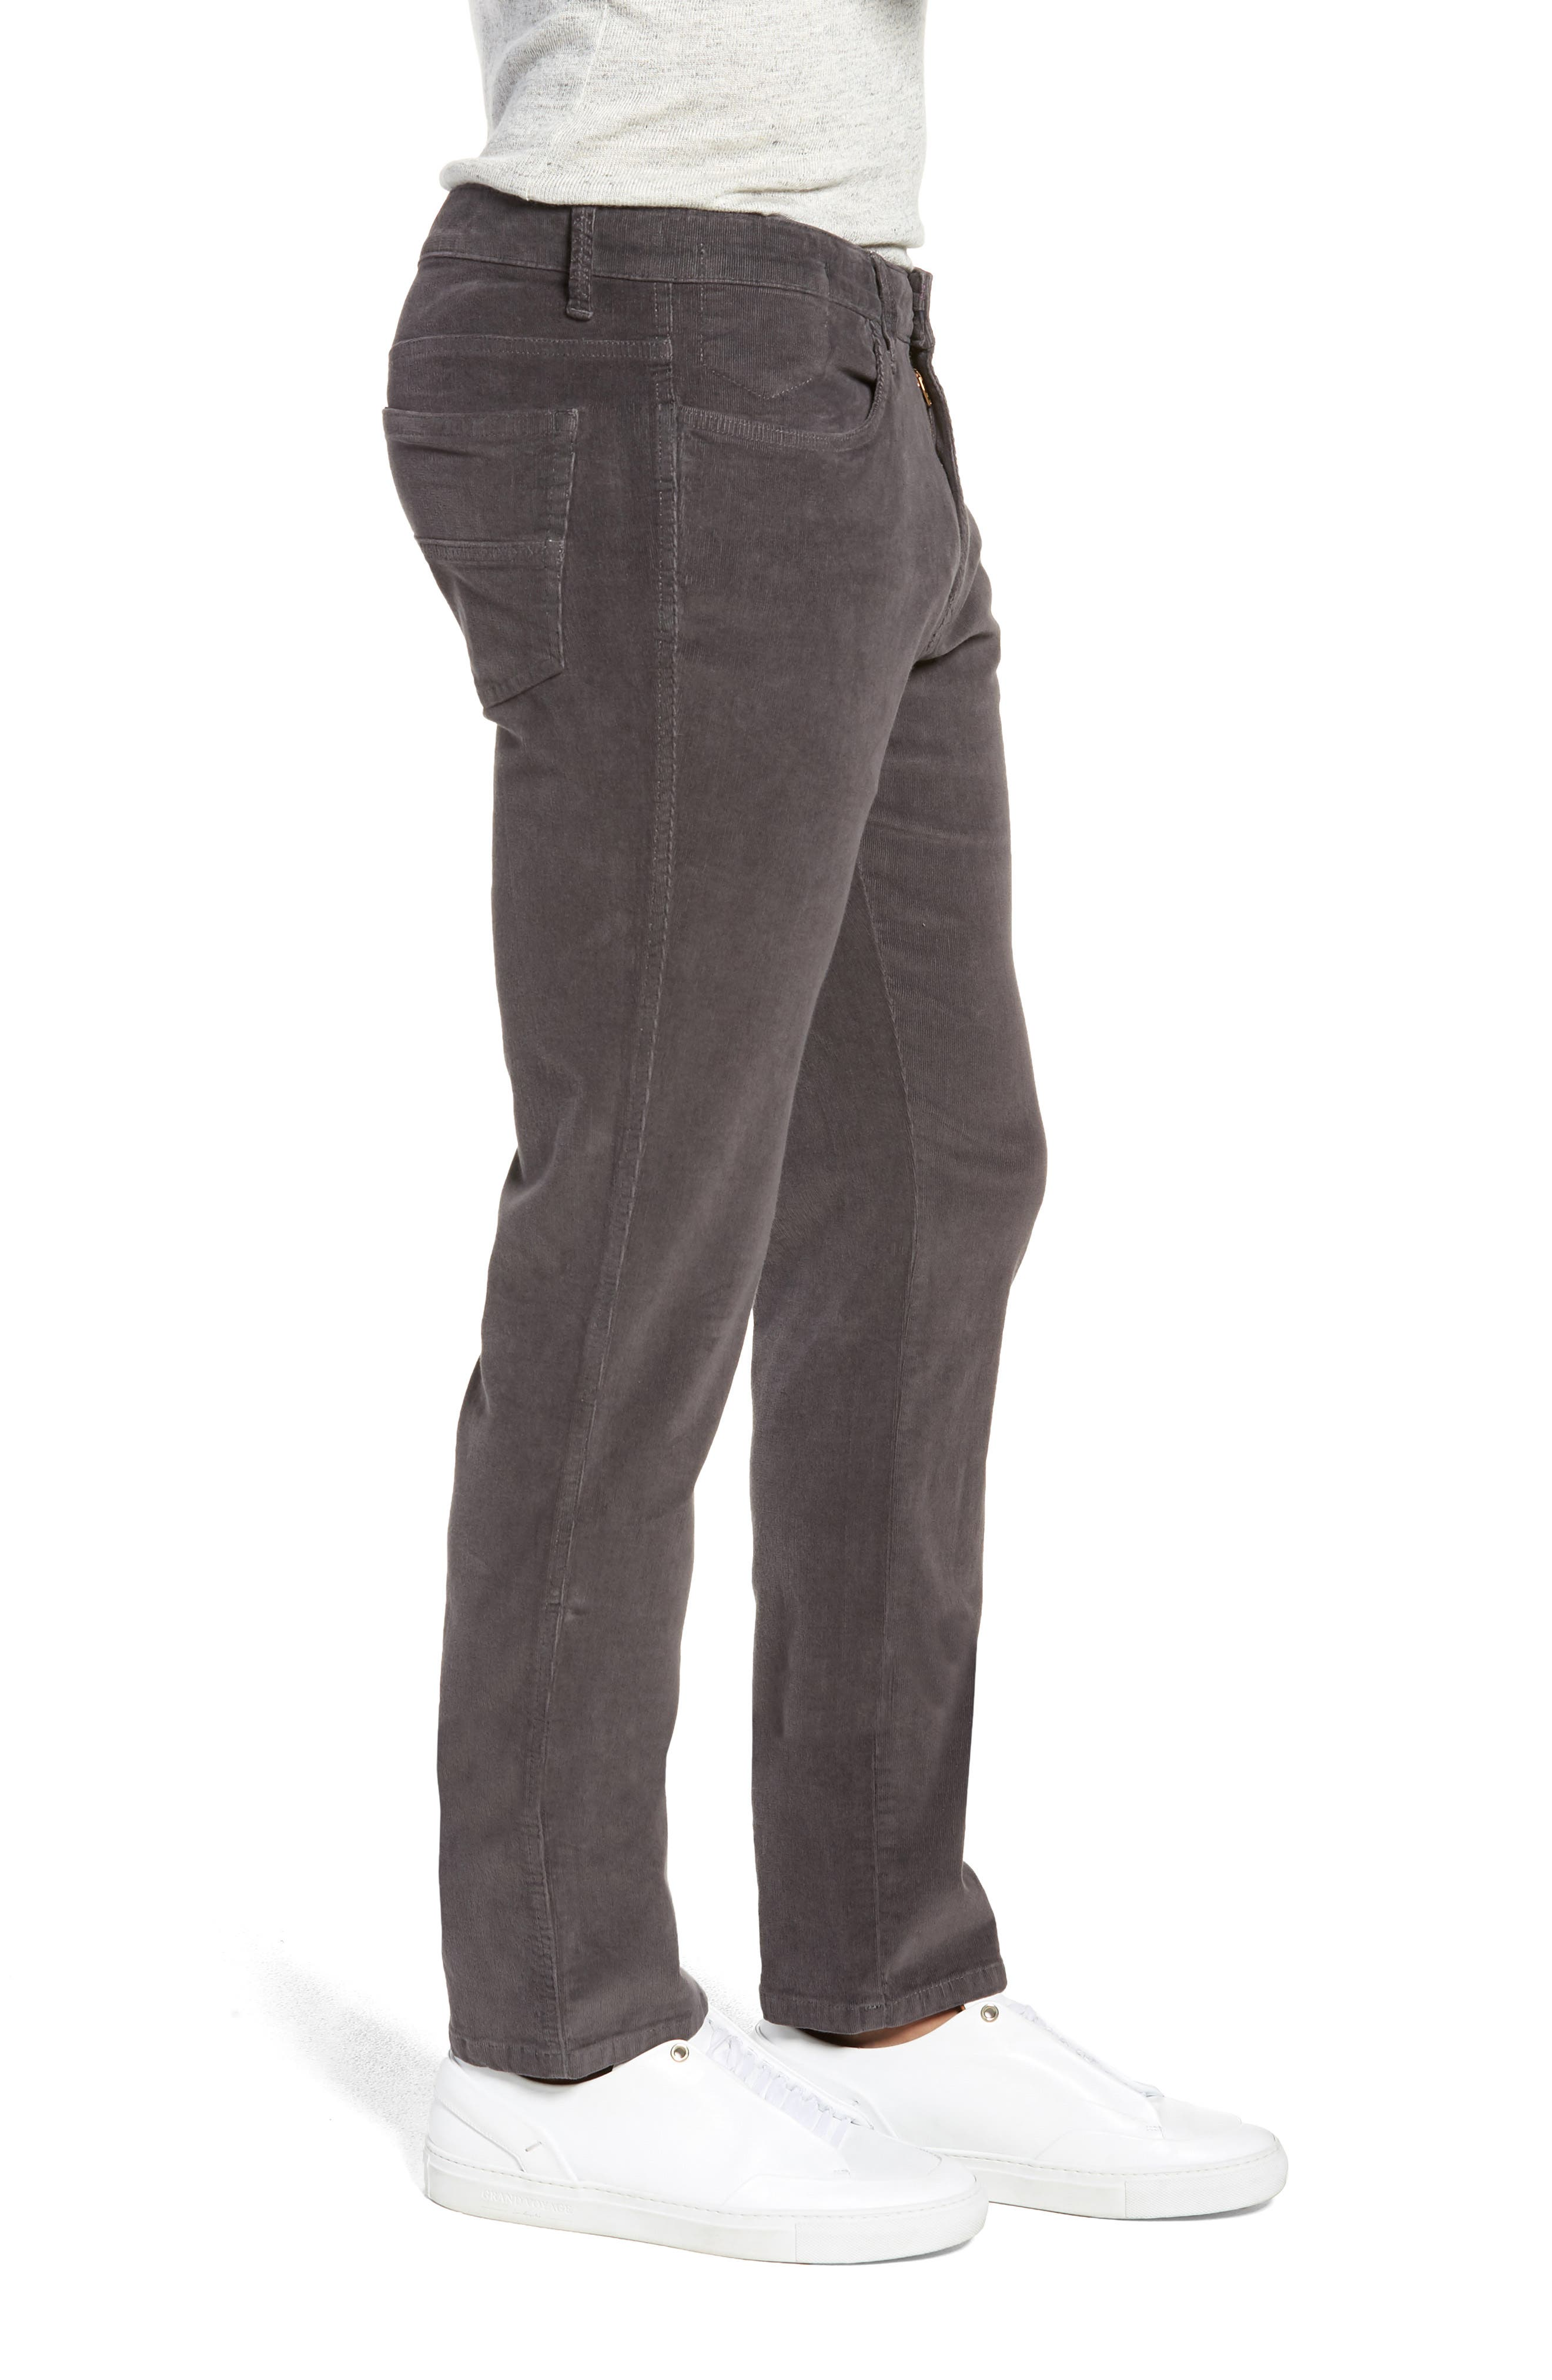 VINTAGE 1946,                             Modern Fit Stretch Corduroy Pants,                             Alternate thumbnail 3, color,                             CHARCOAL